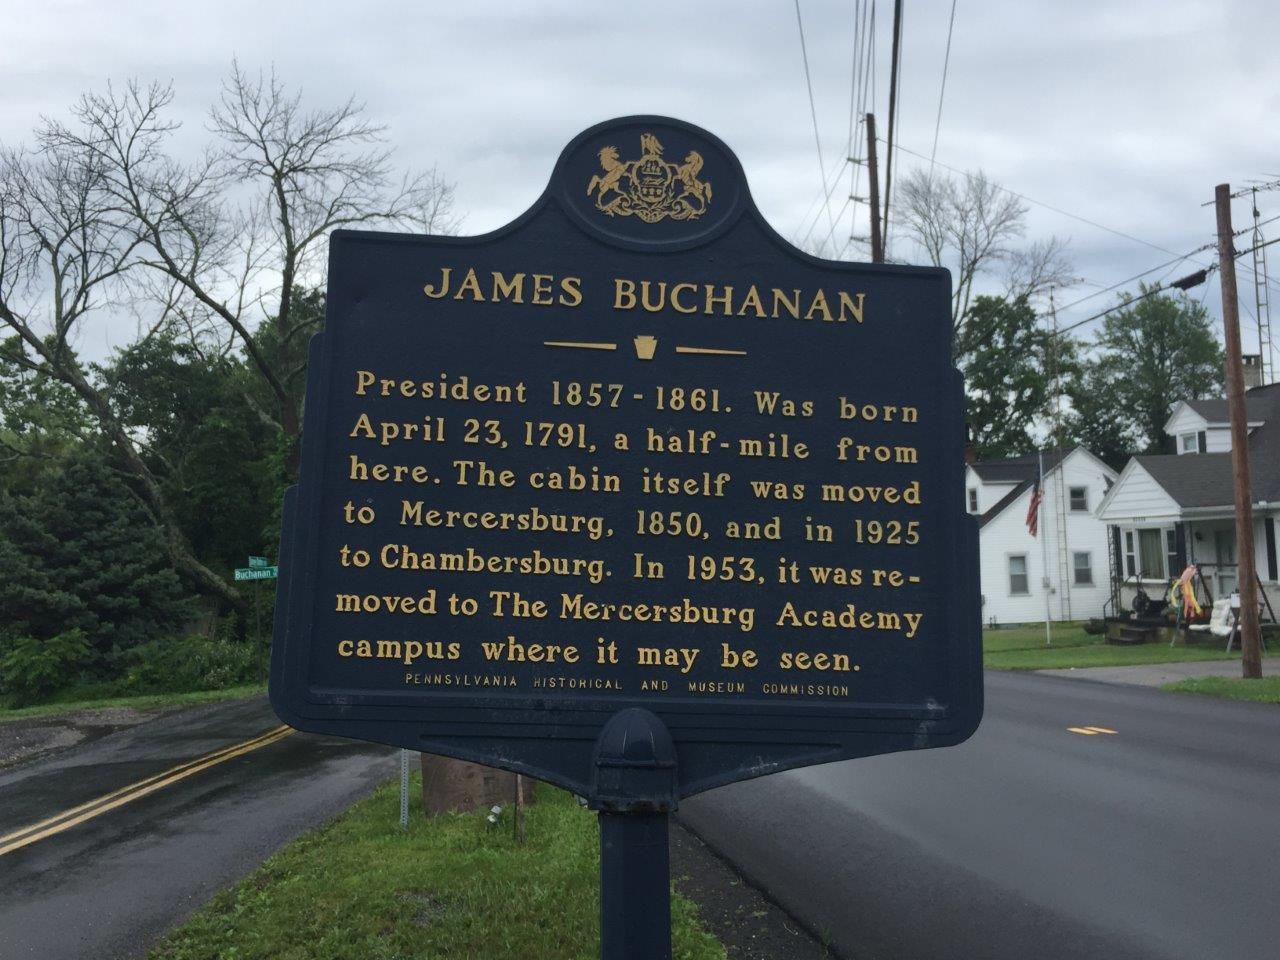 photo of James Buchanan birthplace historical marker